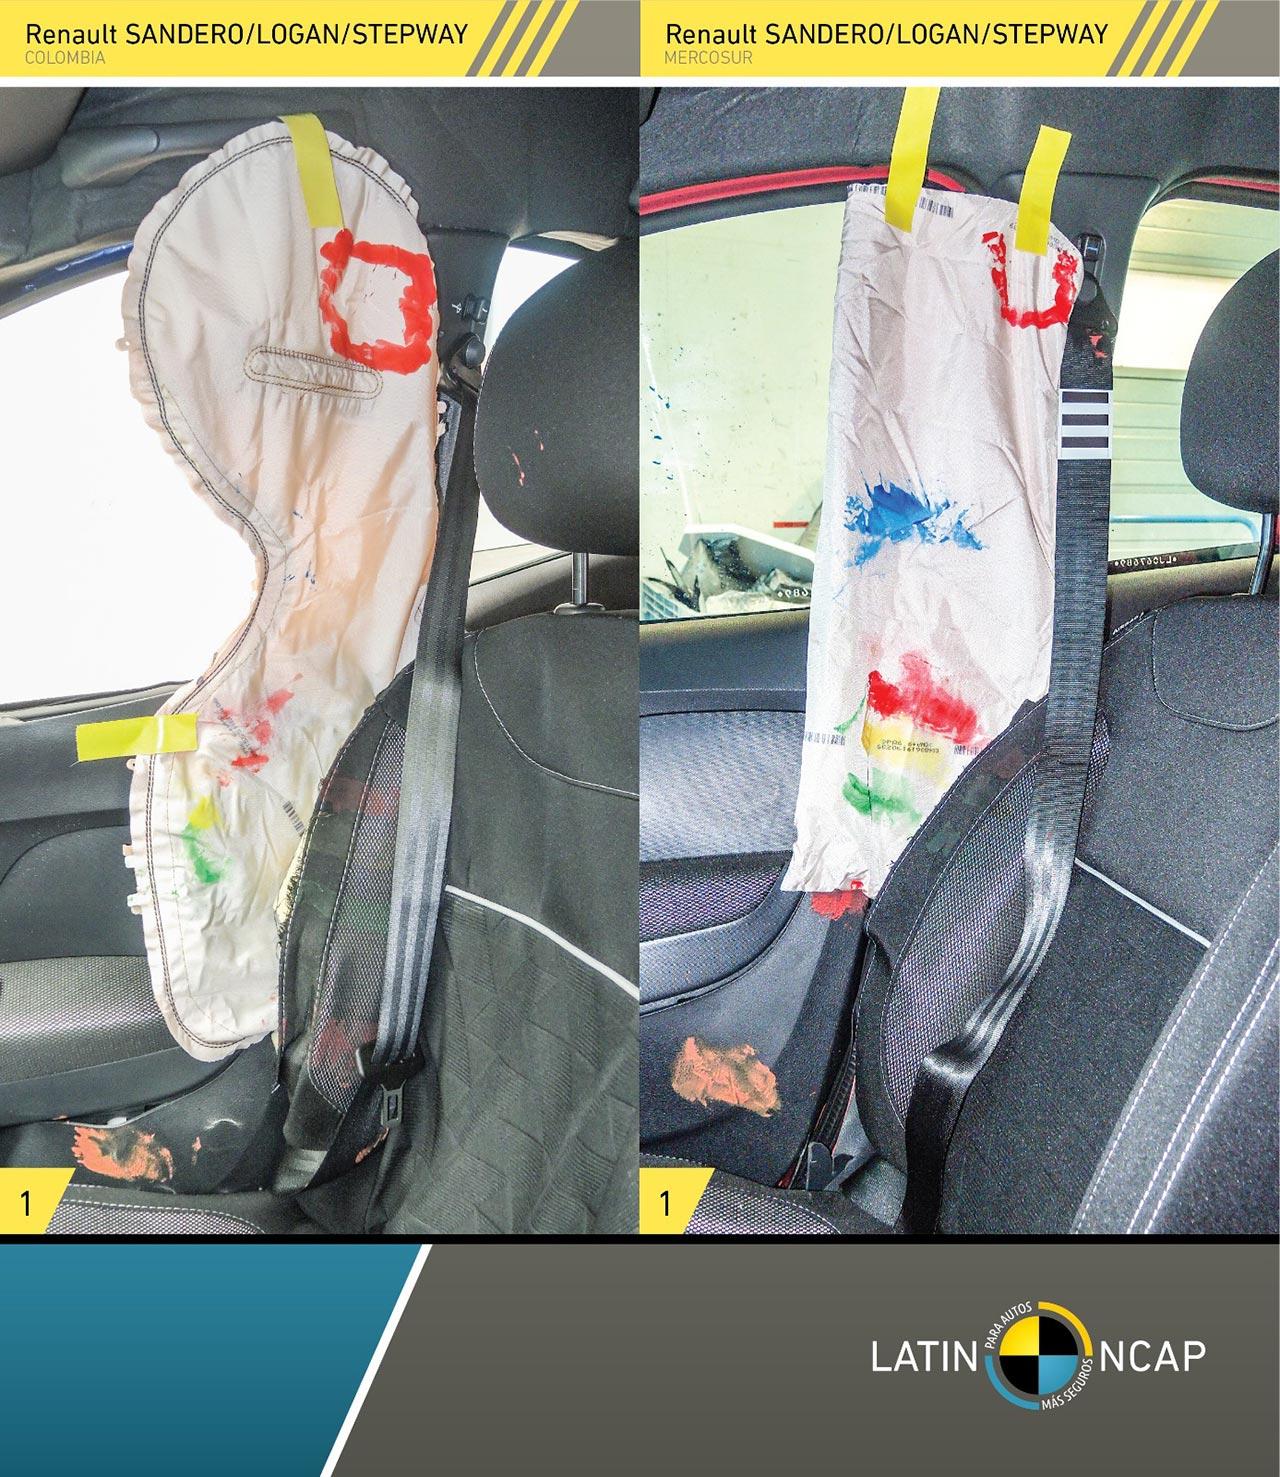 Renault Sandero Mercosur airbags distintos